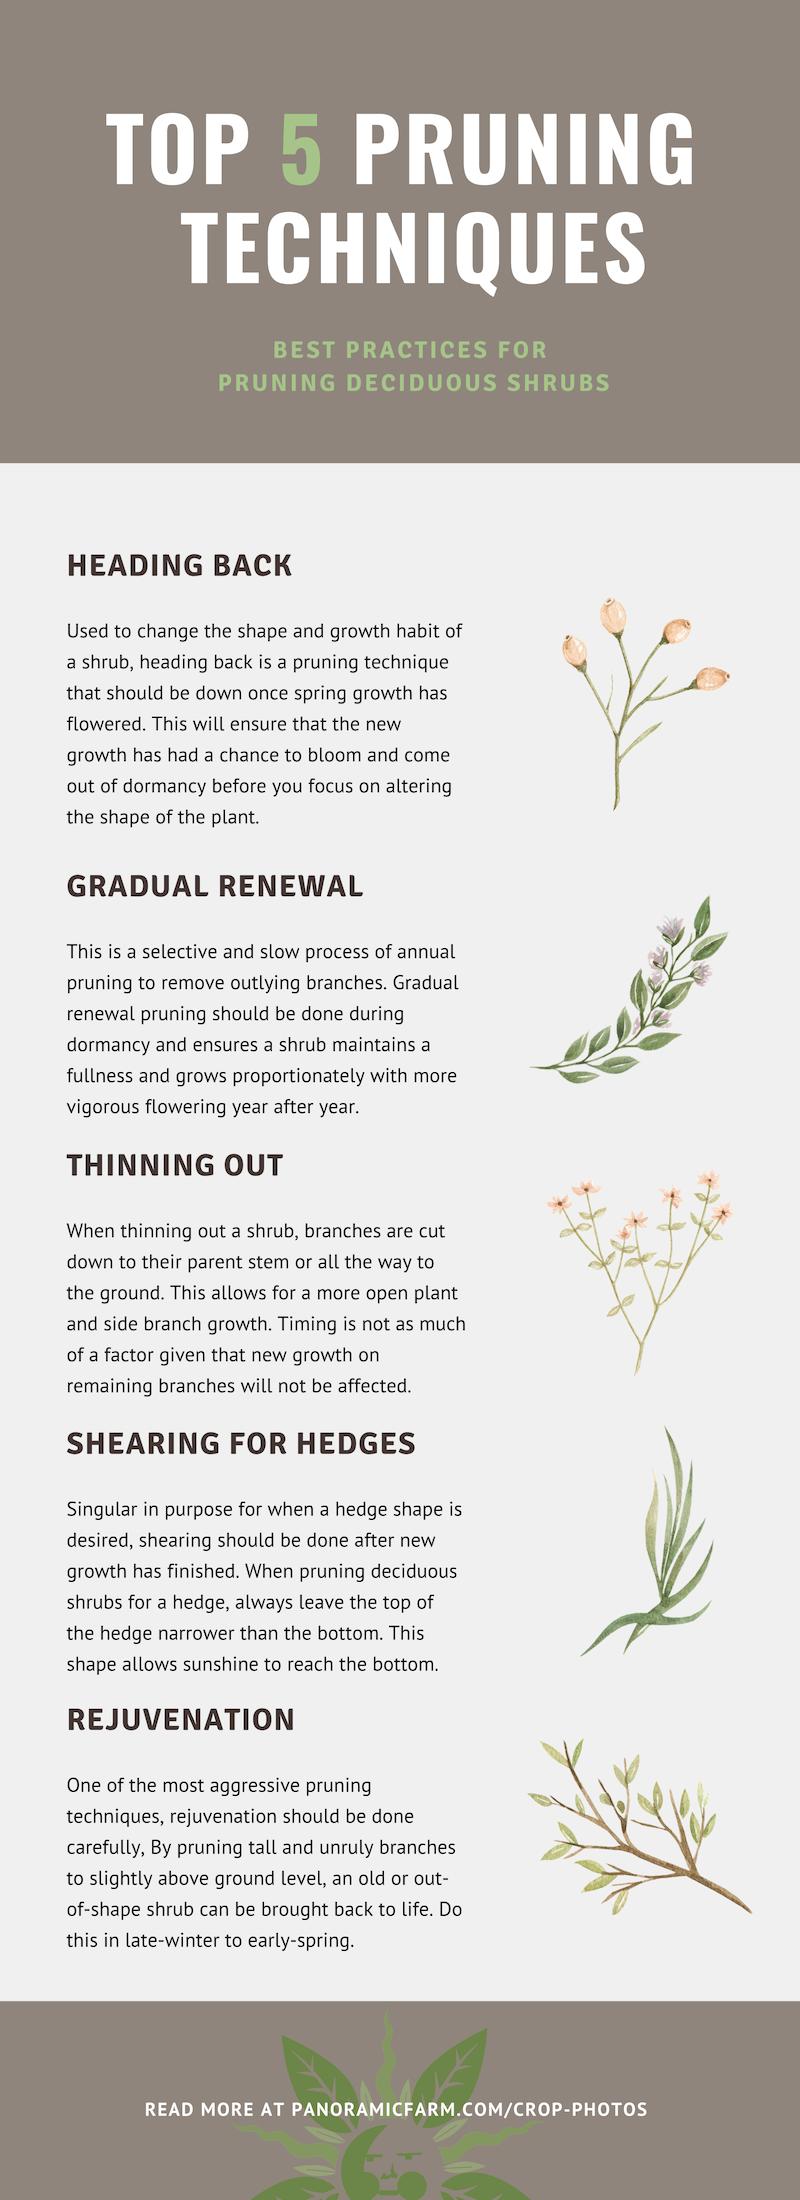 Sources: https://www.mortonarb.org & https://aggie-horticulture.tamu.edu